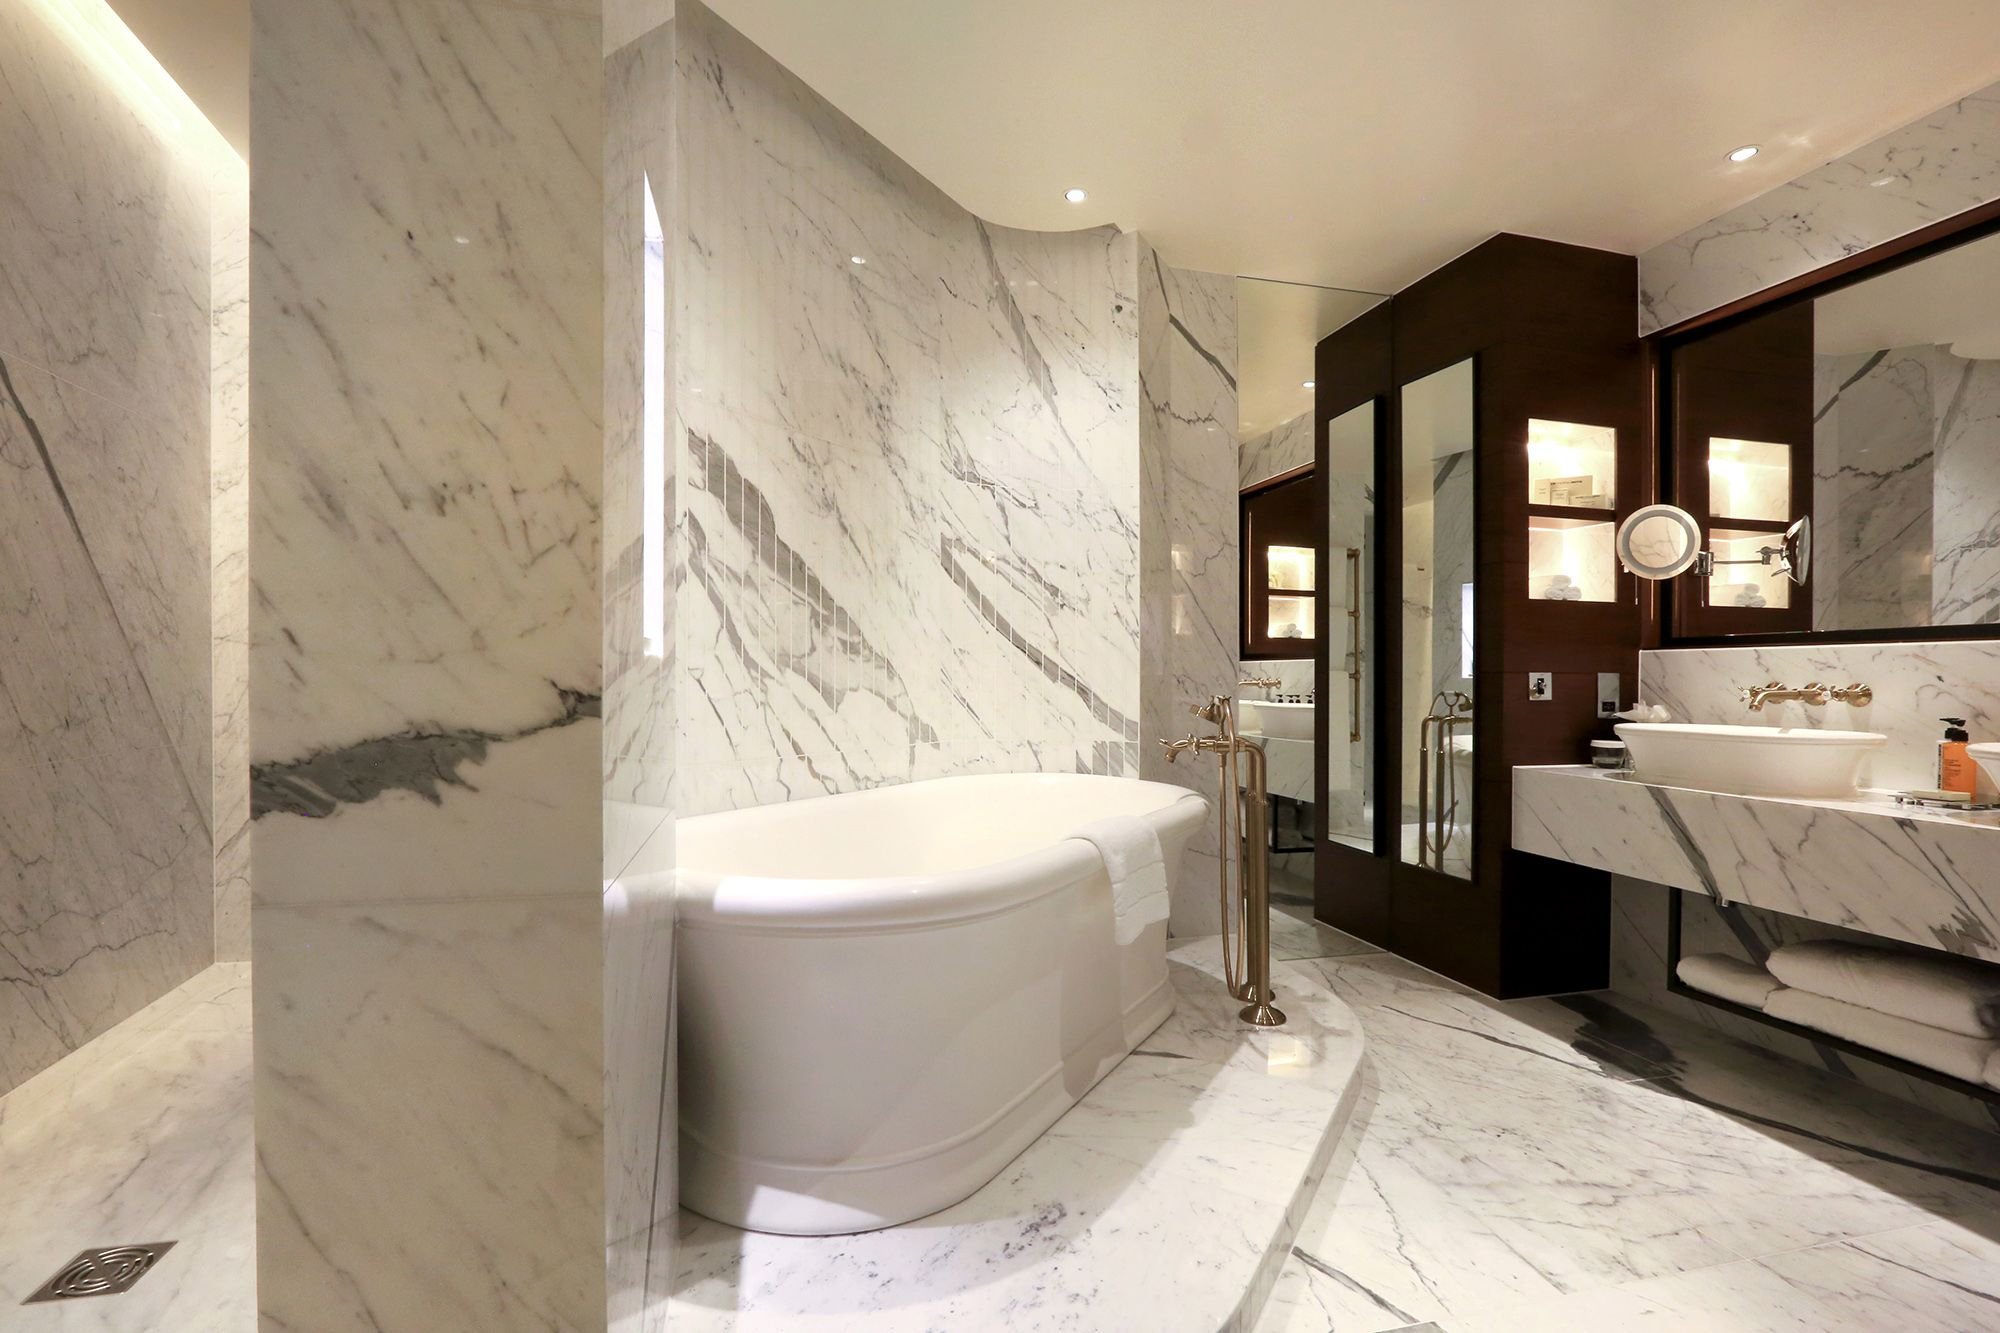 Top 5 Features Guests Need In Their Hotel En-Suite